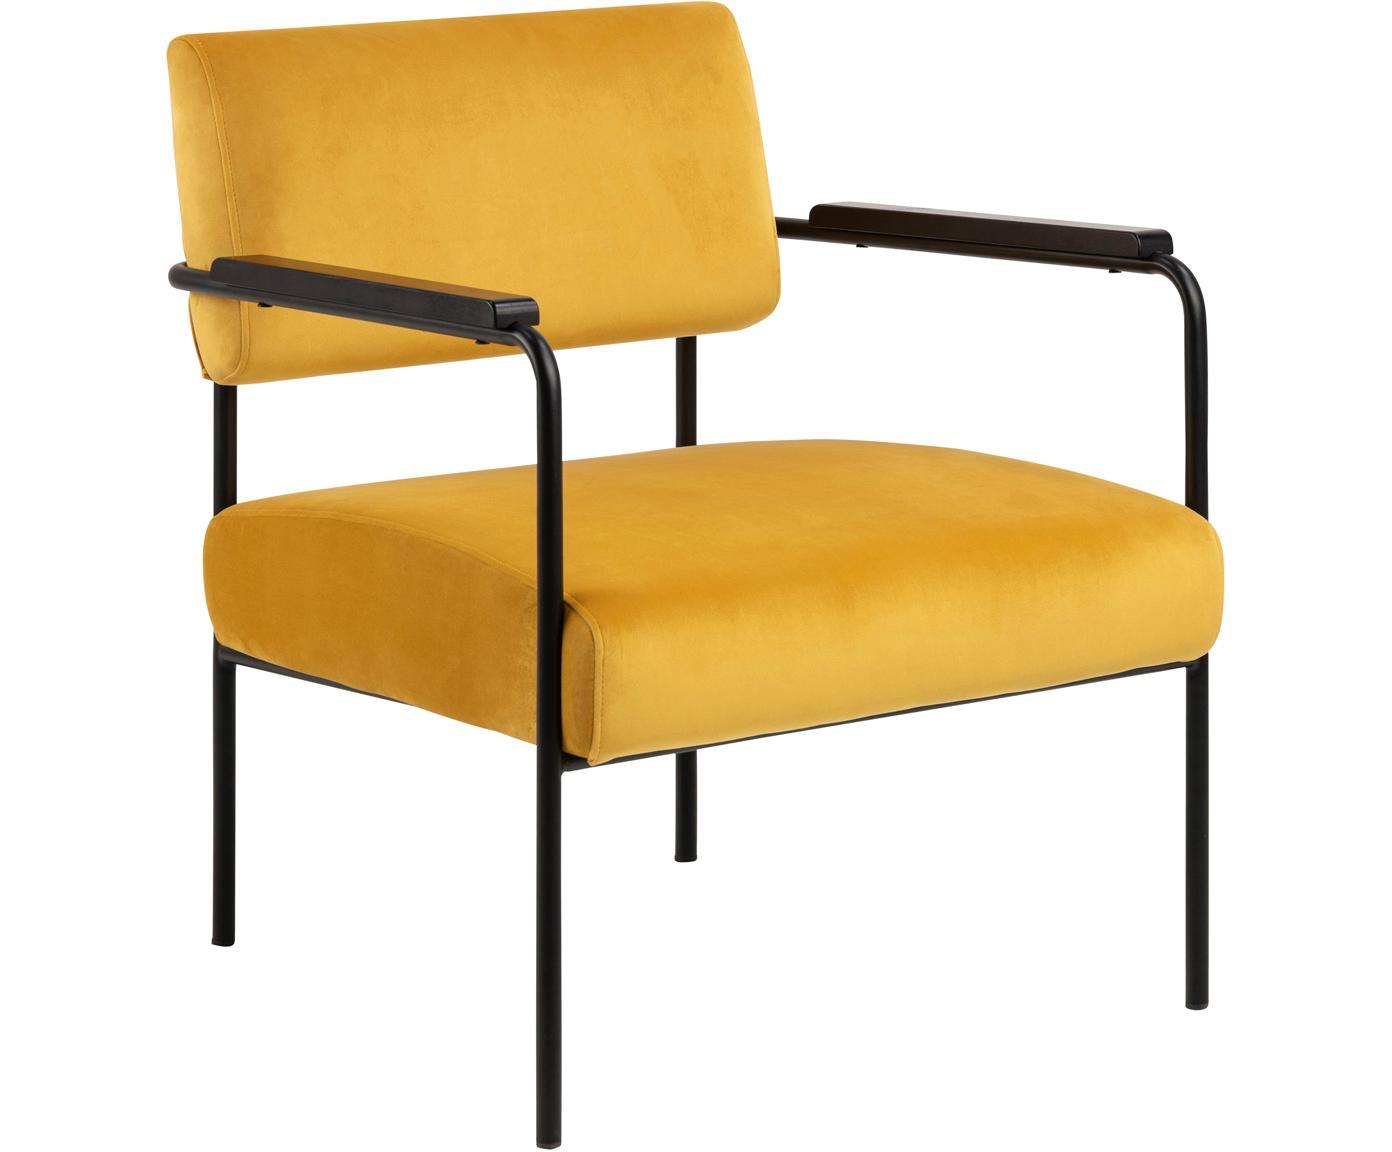 Samt-Loungesessel Cloe, Bezug: Polyestersamt 25.000 Sche, Gestell: Metall, pulverbeschichtet, Samt Gelb, B 67 x T 67 cm